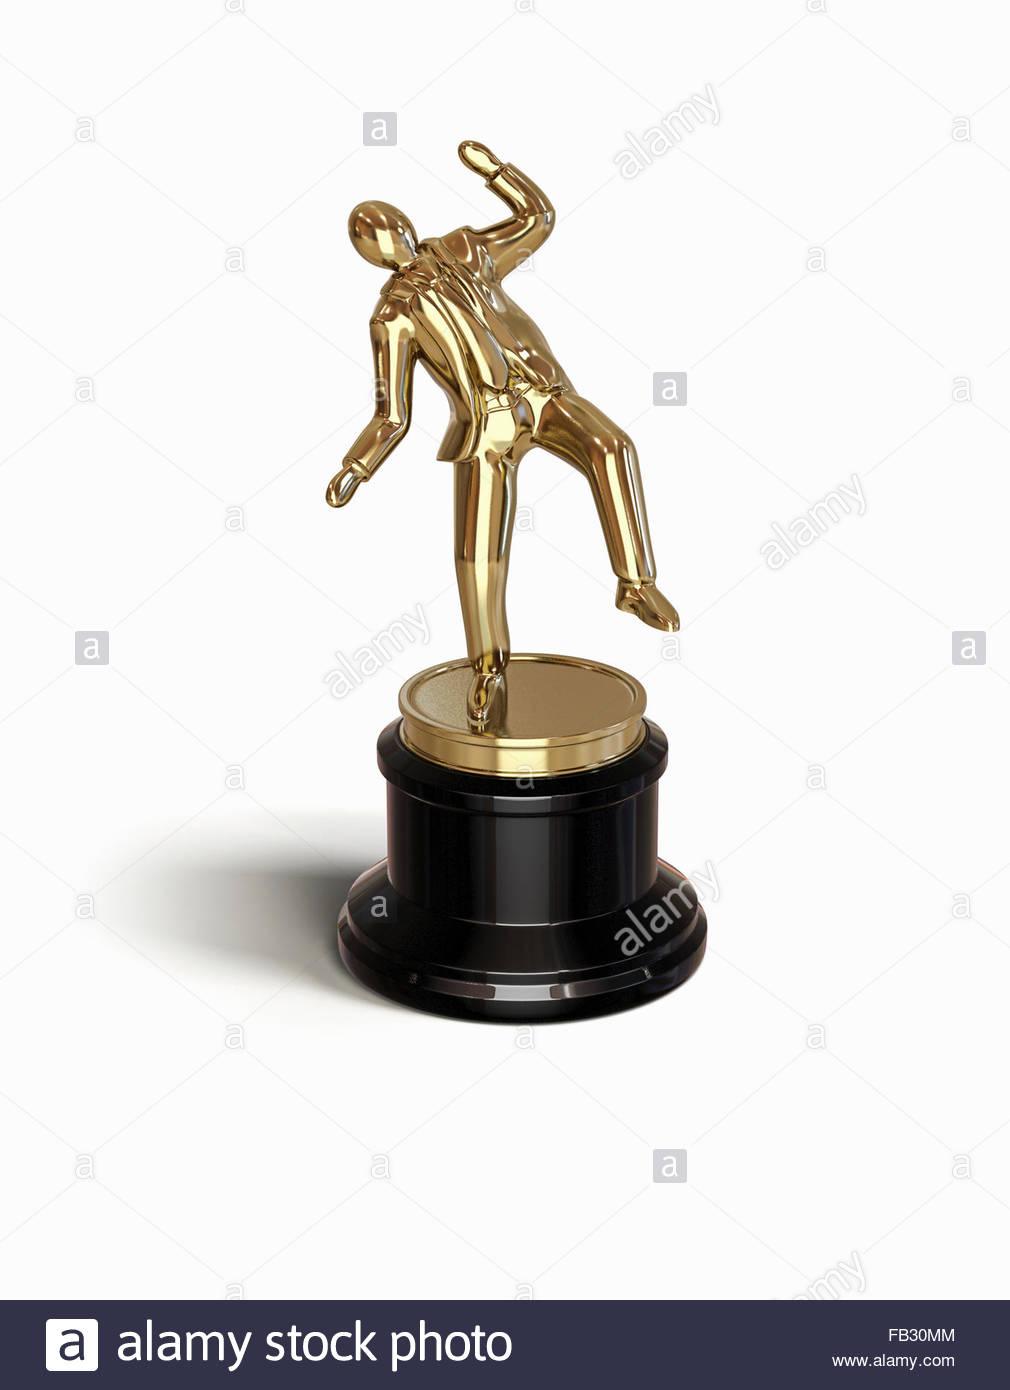 Gold businessman award trophy leaning off balance - Stock Image